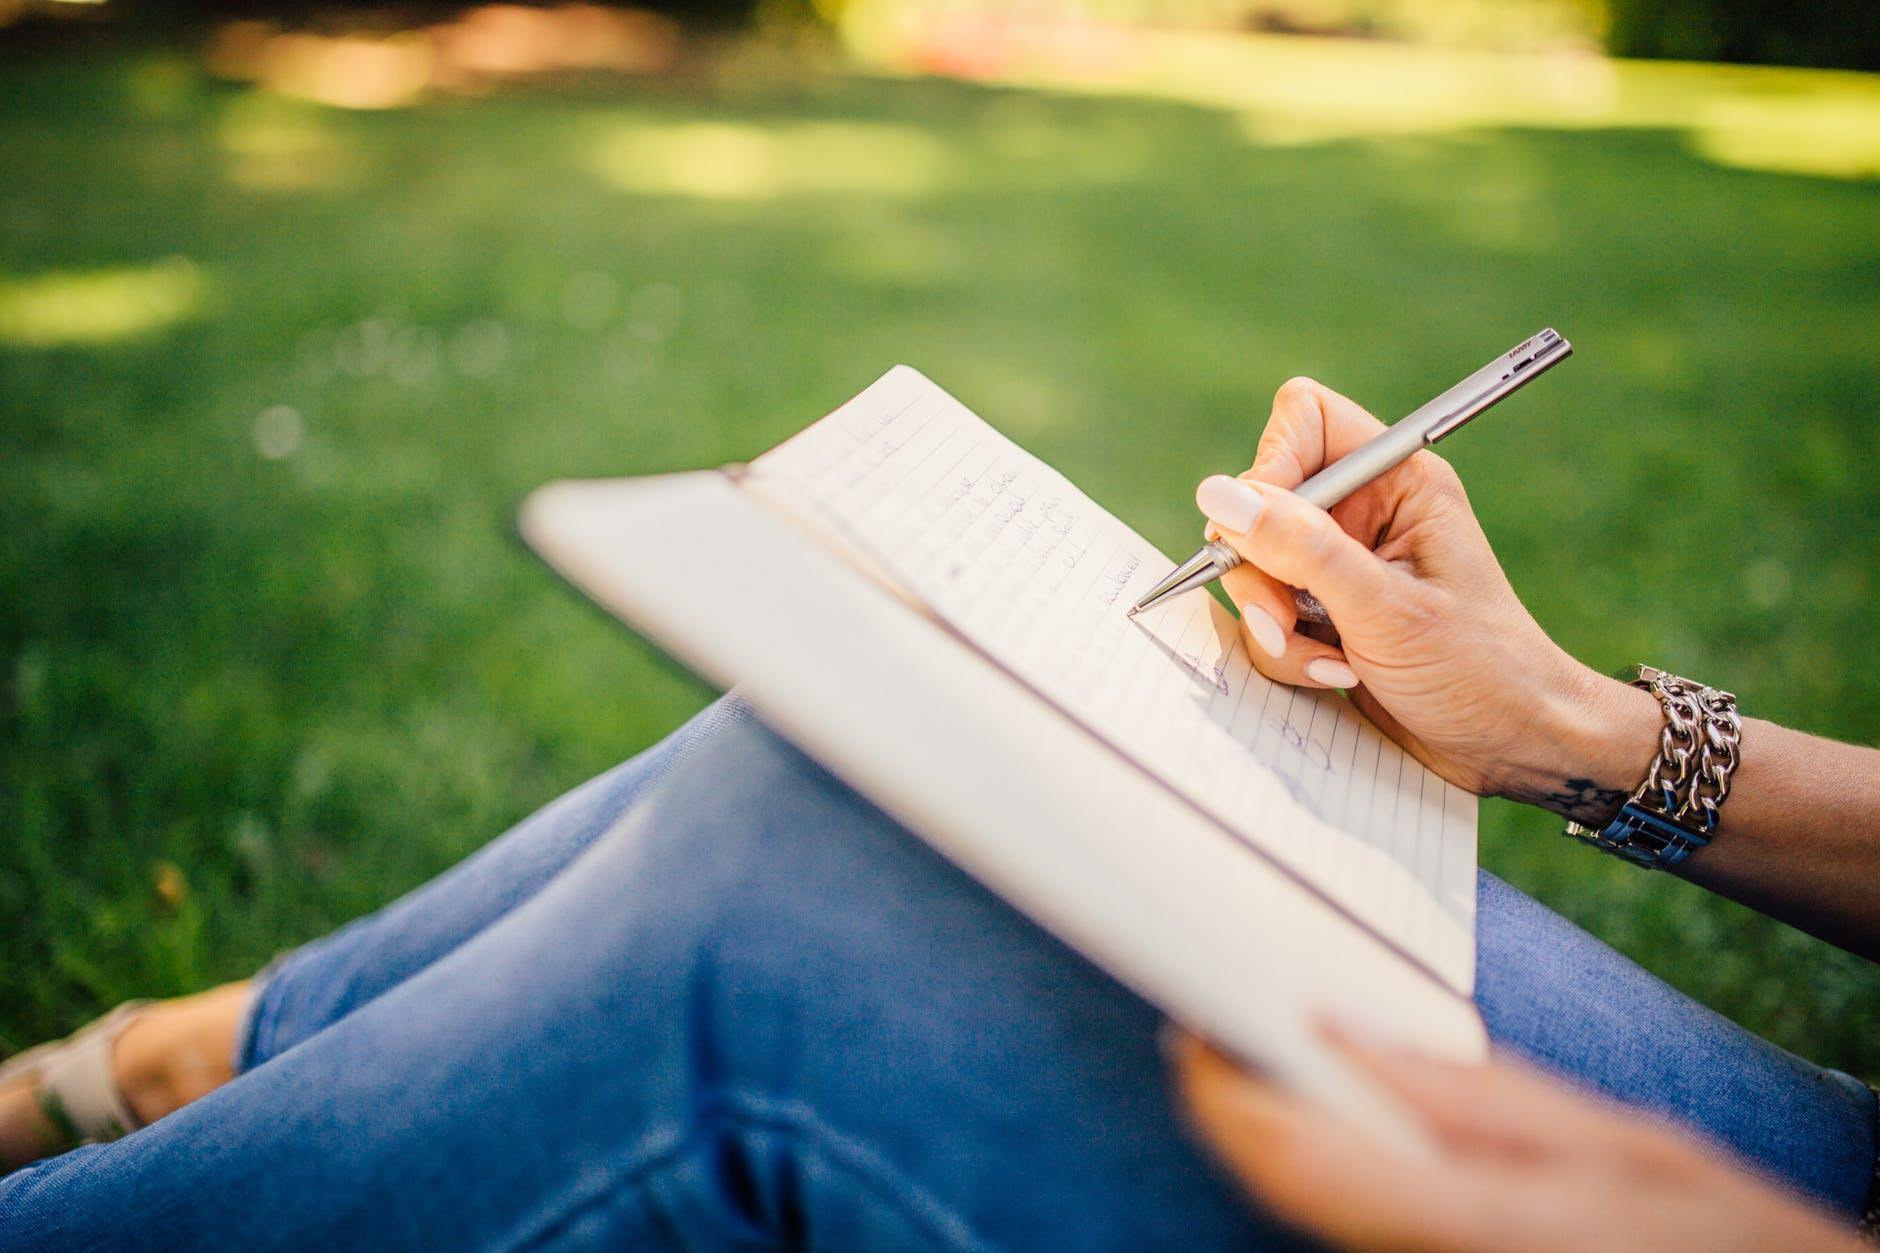 Menulis Sebagai Bentuk Transformasi Diri - deviratnaningayu.com